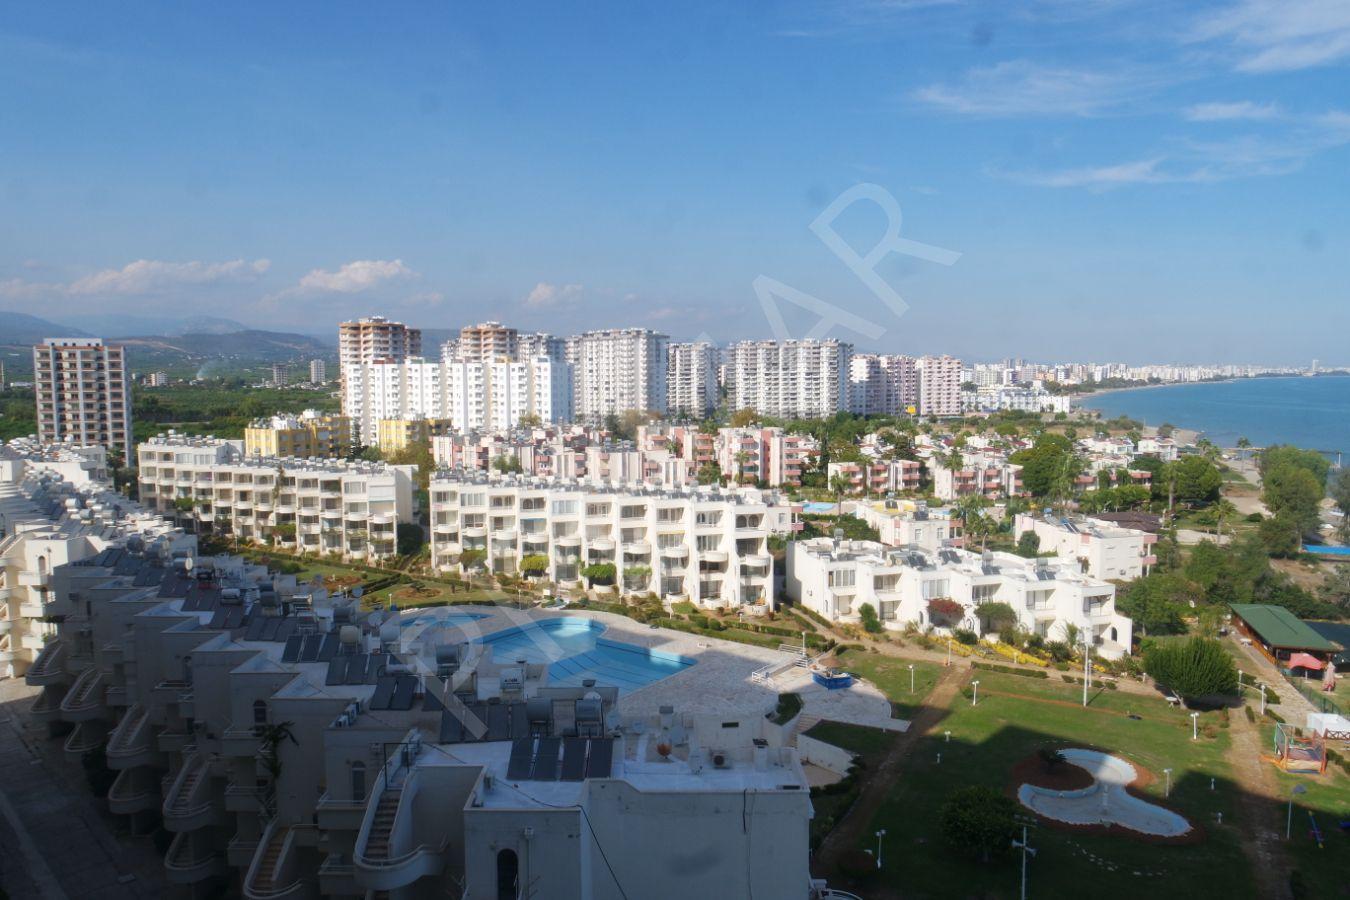 Fa Emlak'tan Tatil Cenneti Liparis 5 Çok Az Kullanılmış Süper Lüx